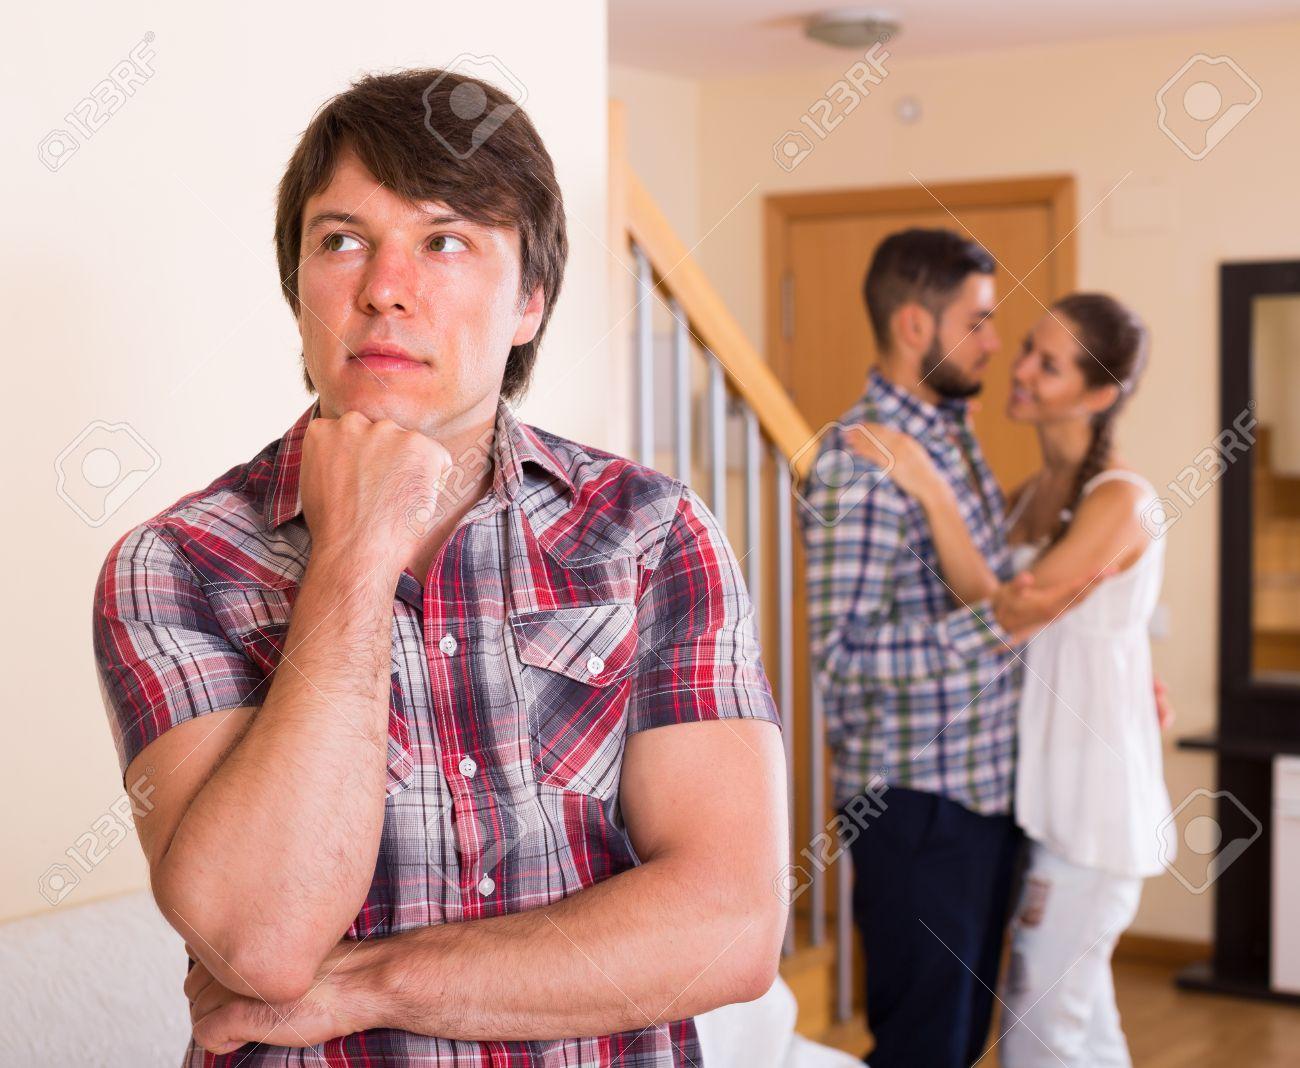 Wife flirting with friend